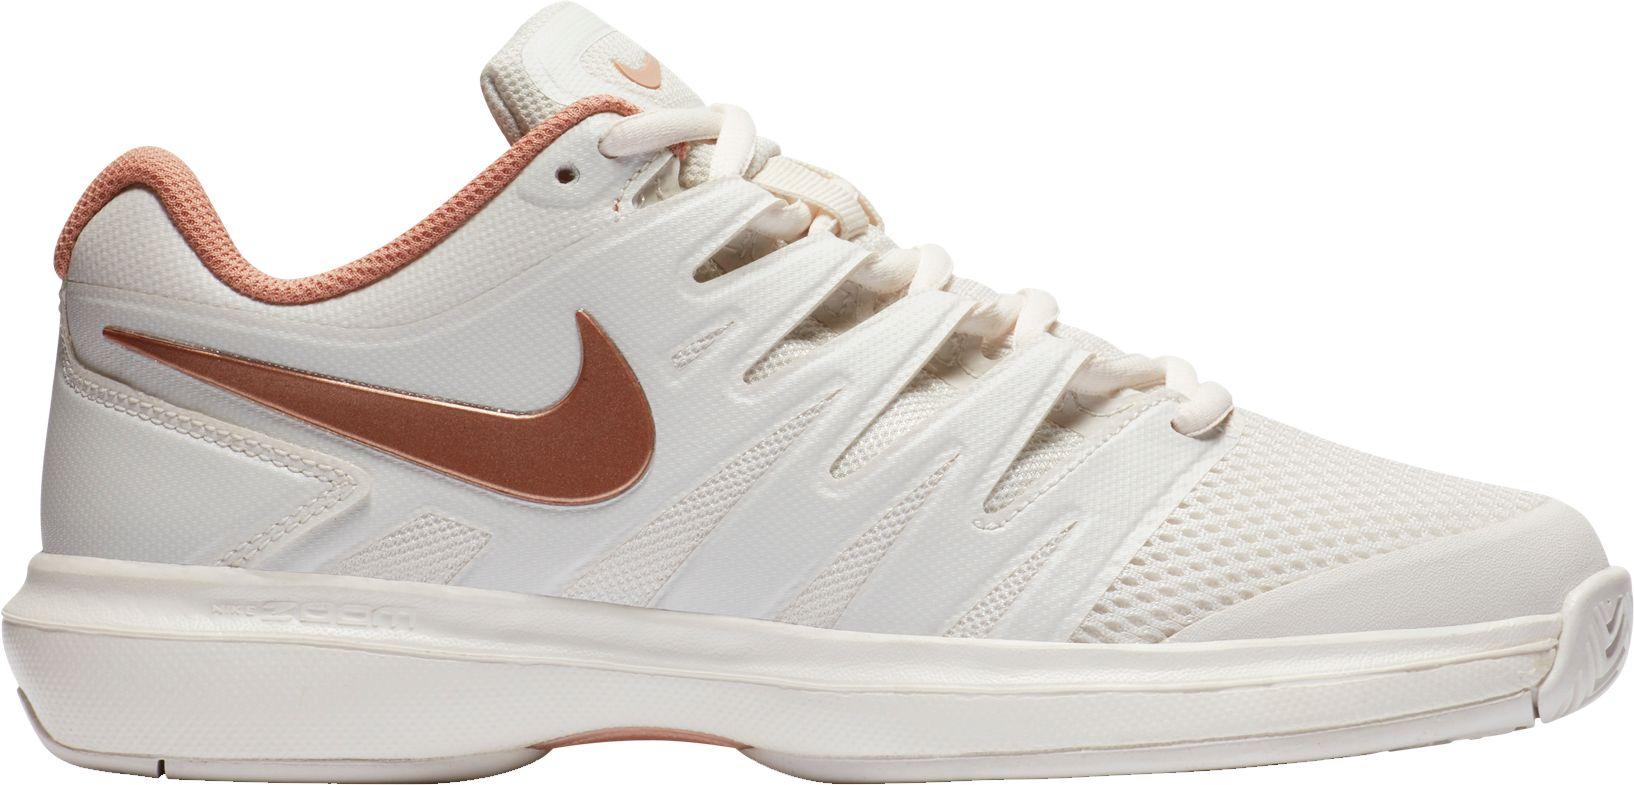 Nike Women's Air Zoom Prestige Tennis Shoes (metallic rosegold) $28 + $6 shipping or free ship on $49+